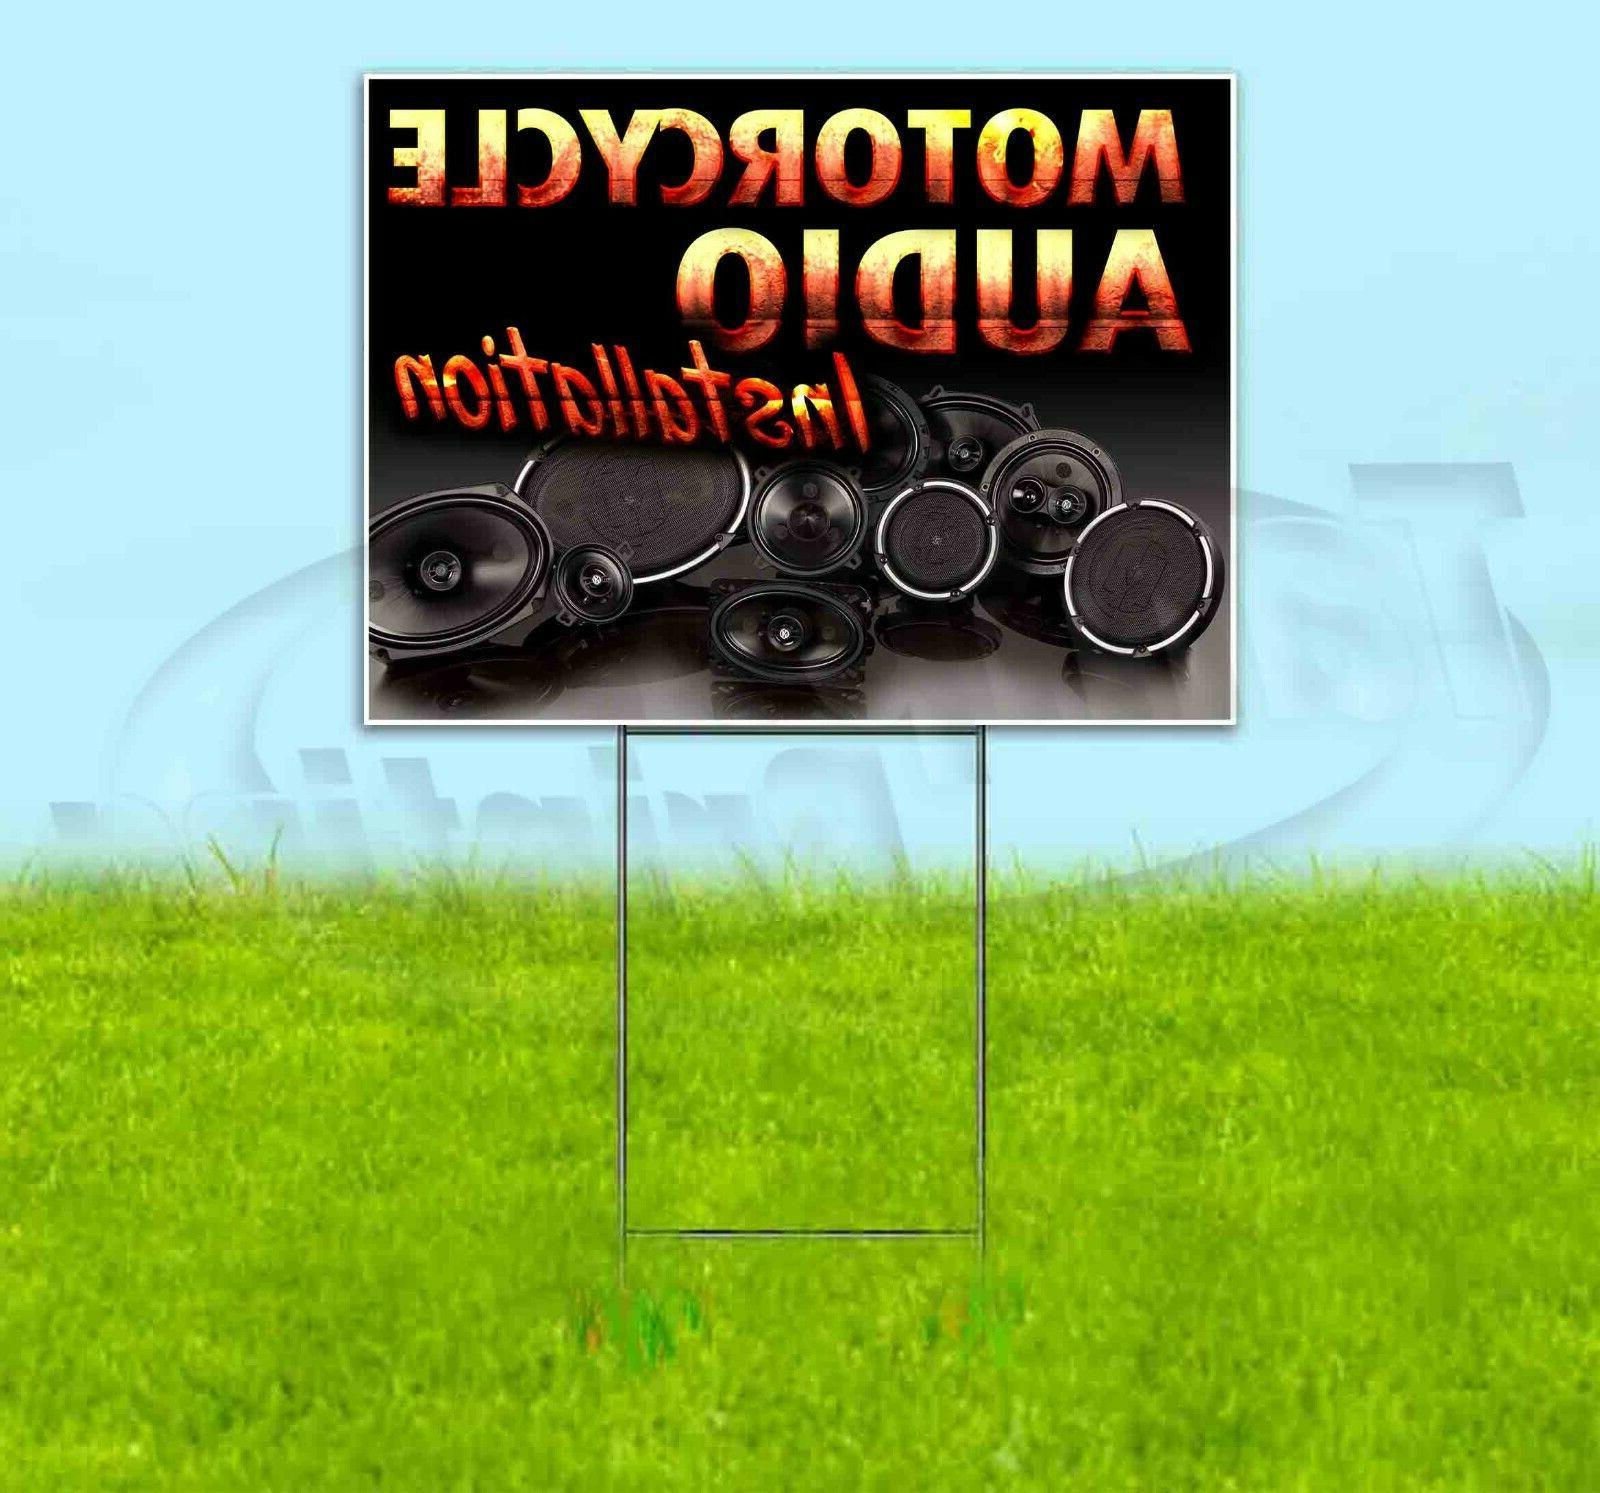 motorcycle audio installation 18x24 yard sign